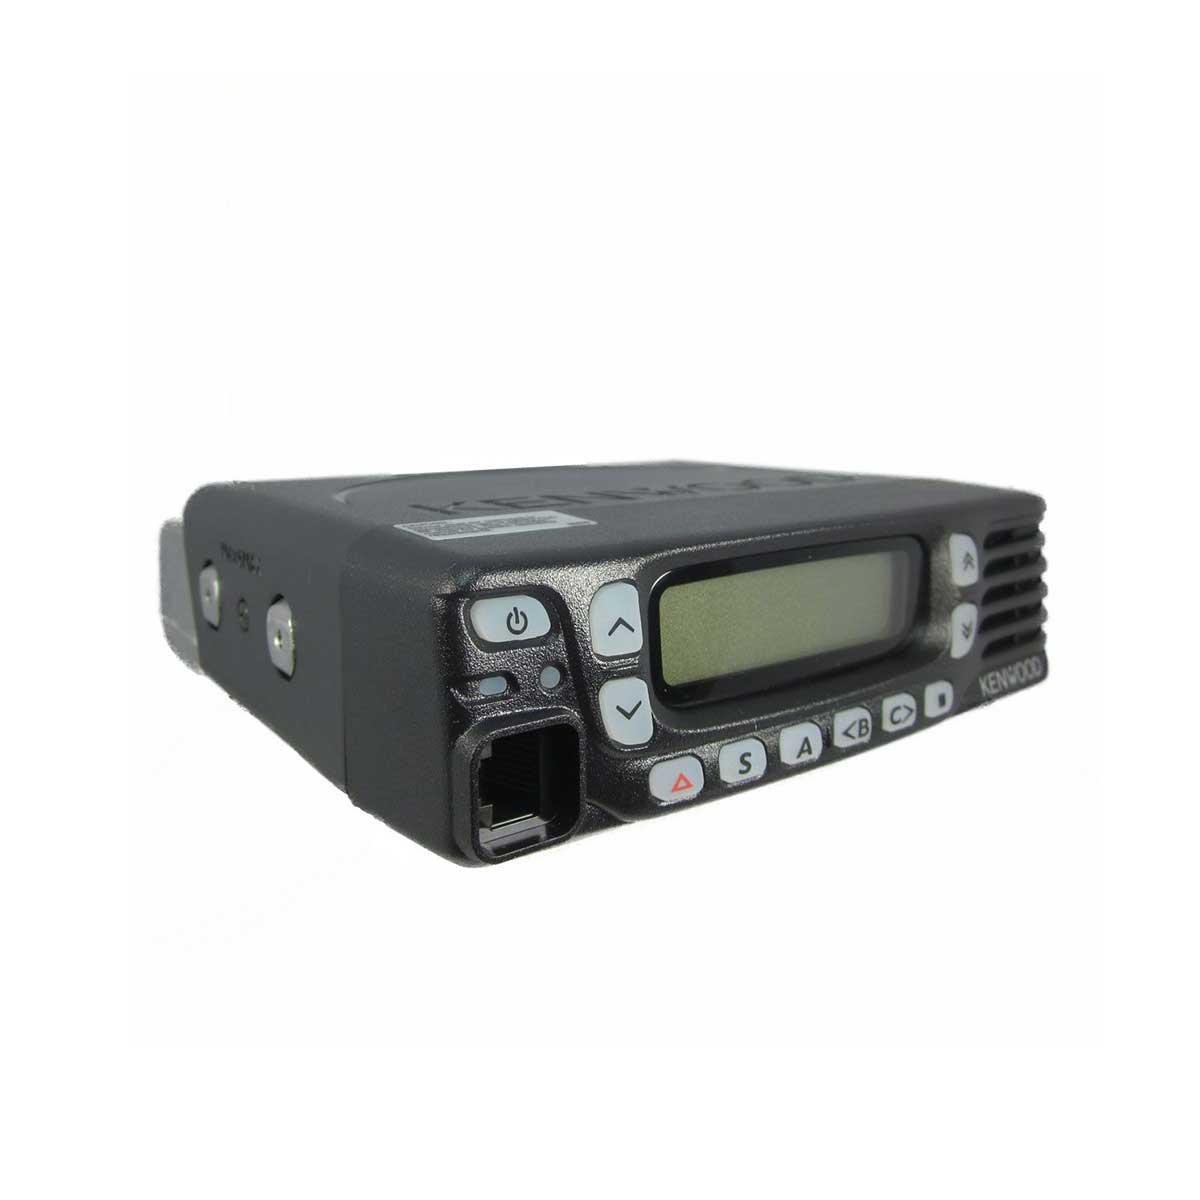 Radio Kenwood TK-7360H Analógico VHF 136-174 MHz